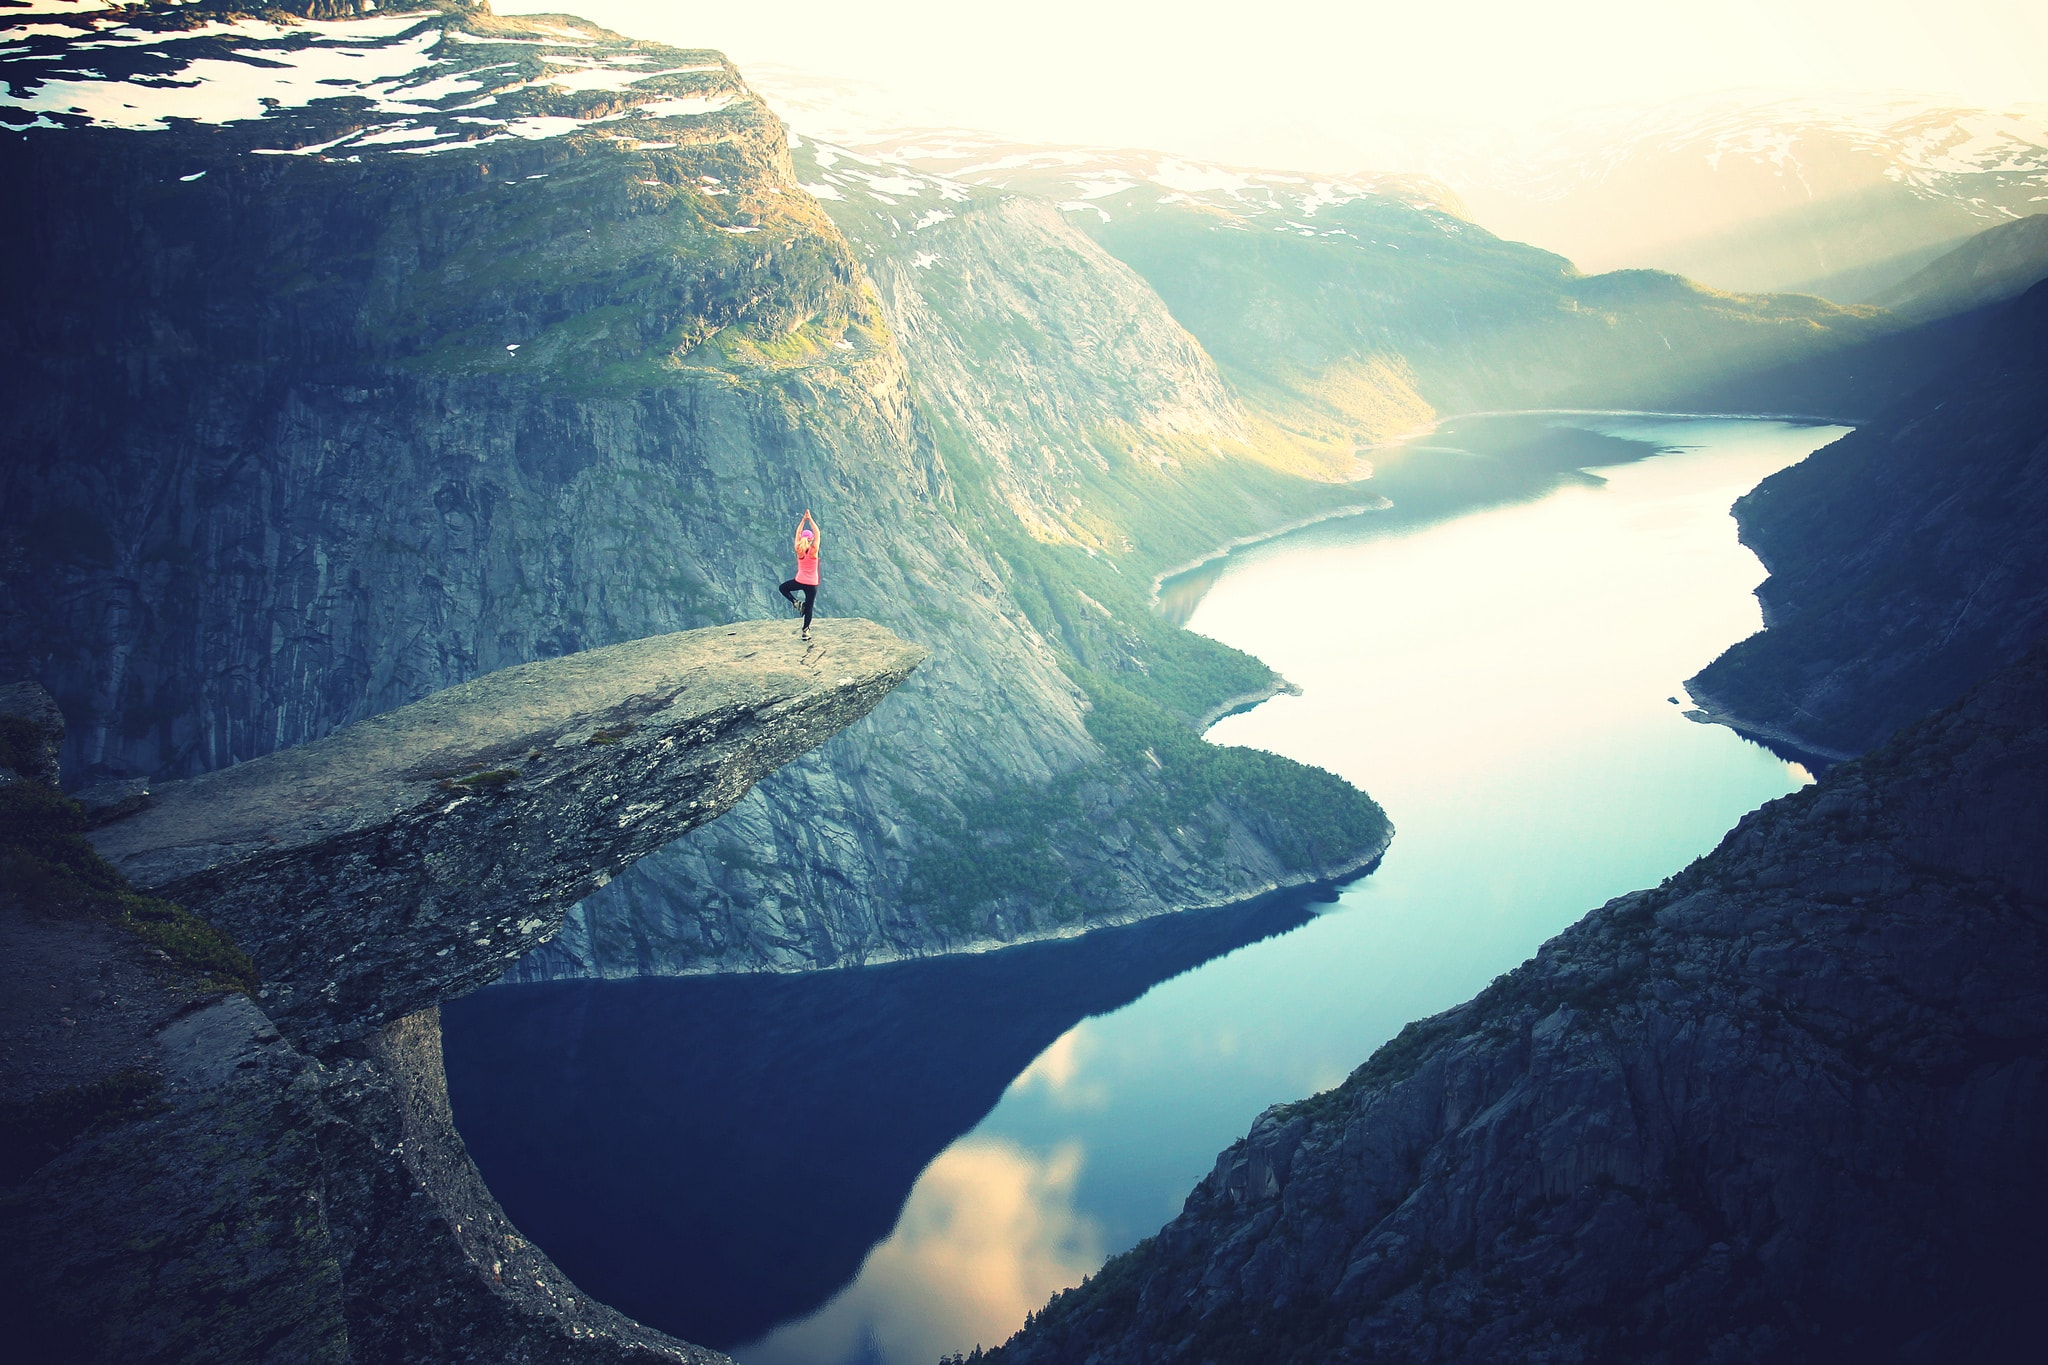 Yoga pose on Trolltunga cliff